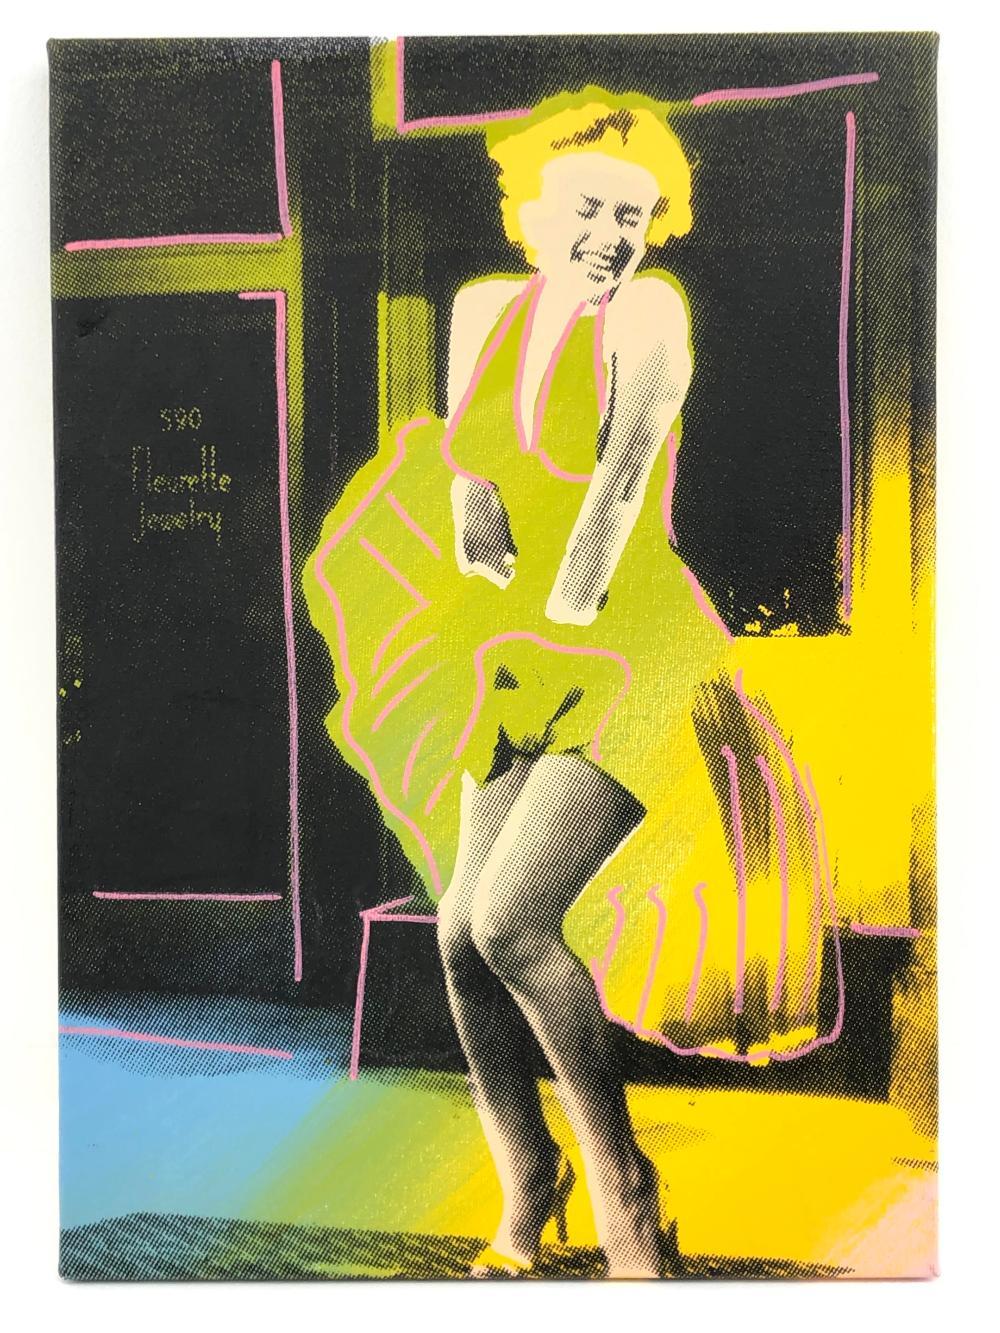 "STEVE KAUFMAN ""MARILYN MONROE: THAT SILLY LITTLE DRESS"" HAND EMBELLISHMENT SIGNED SCREENPRINT ON CANVAS"